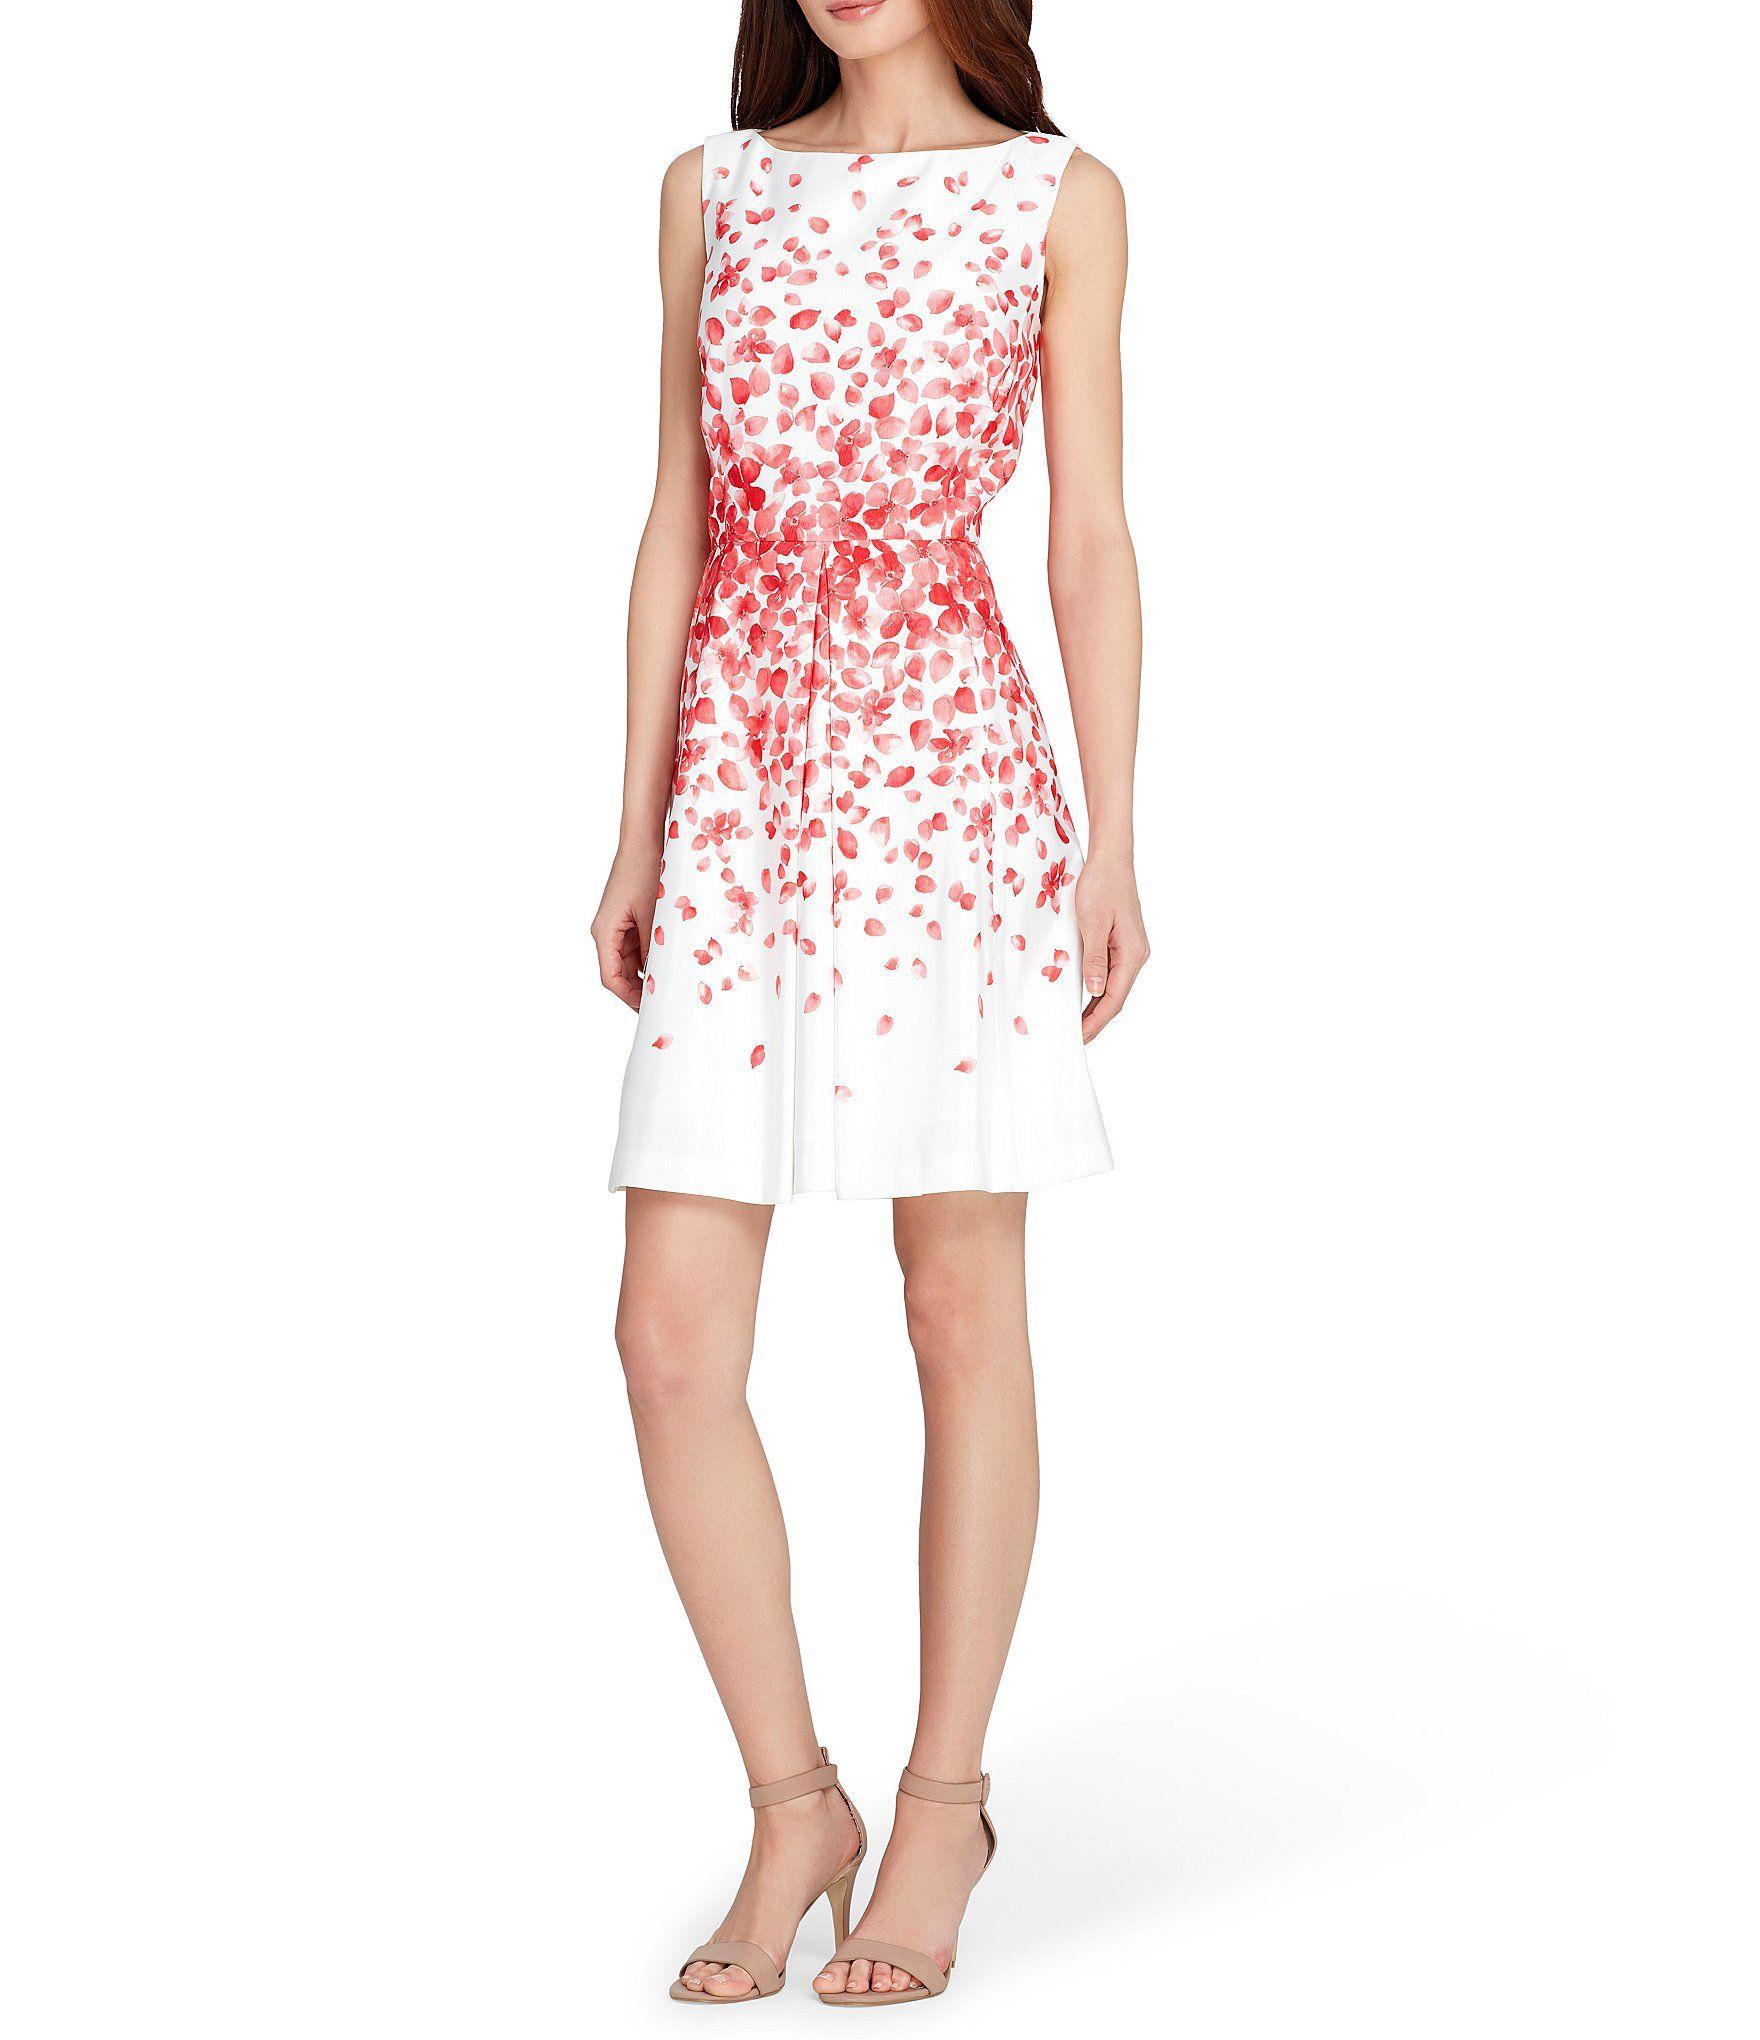 Shop For Tahari Asl Floral Print Fit And Flare Dress At Dillards Com Visit Dillards Com To Find Clothing Acce Fit And Flare Dress Flare Dress Fit Flare Dress [ 2040 x 1760 Pixel ]